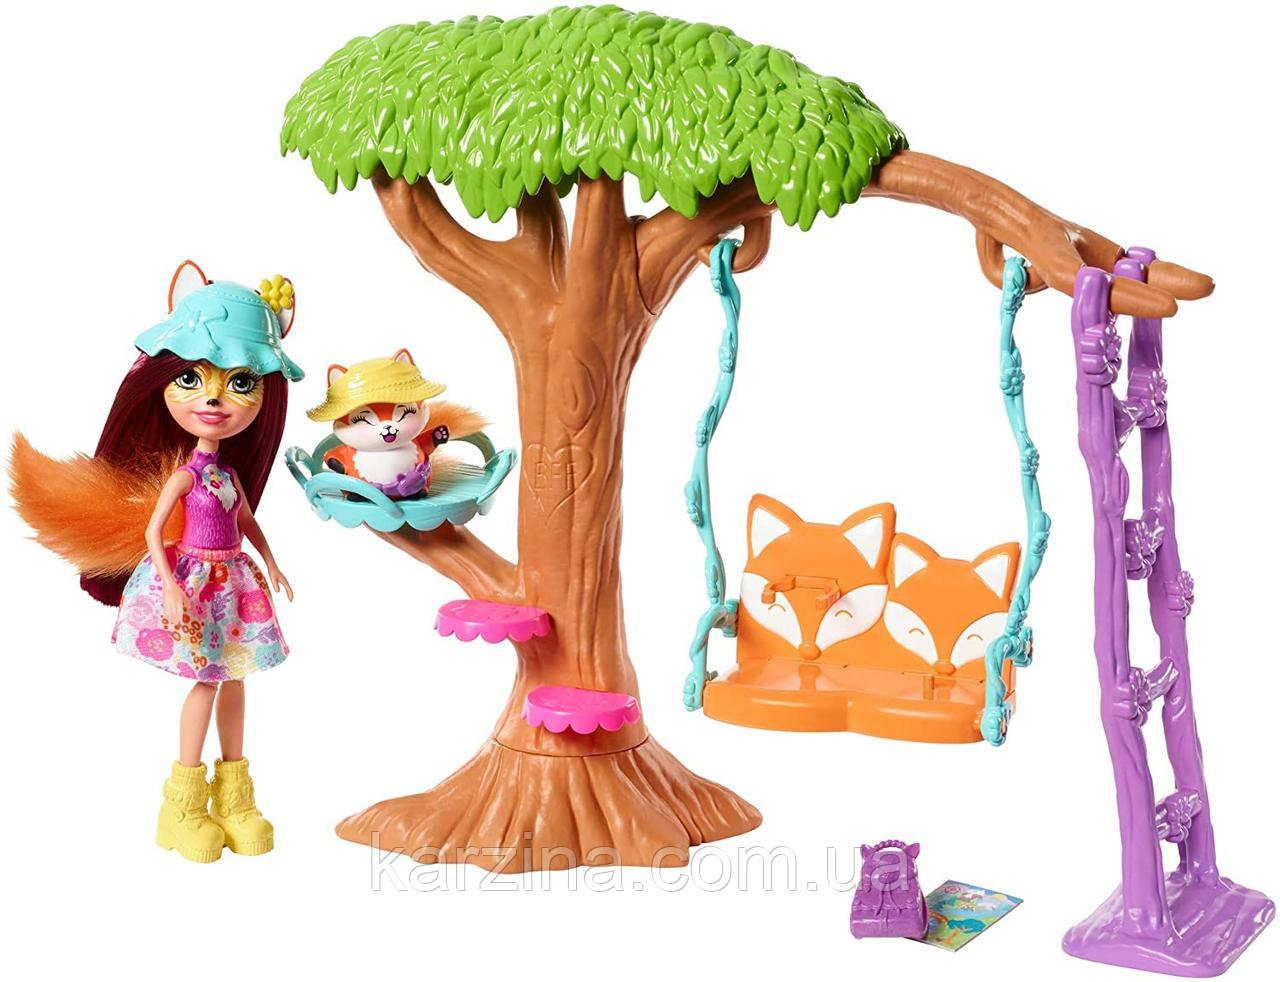 Набор качели на дереве Лисенок Фелисити Фокс и Флик Enchantimals Playground Playset